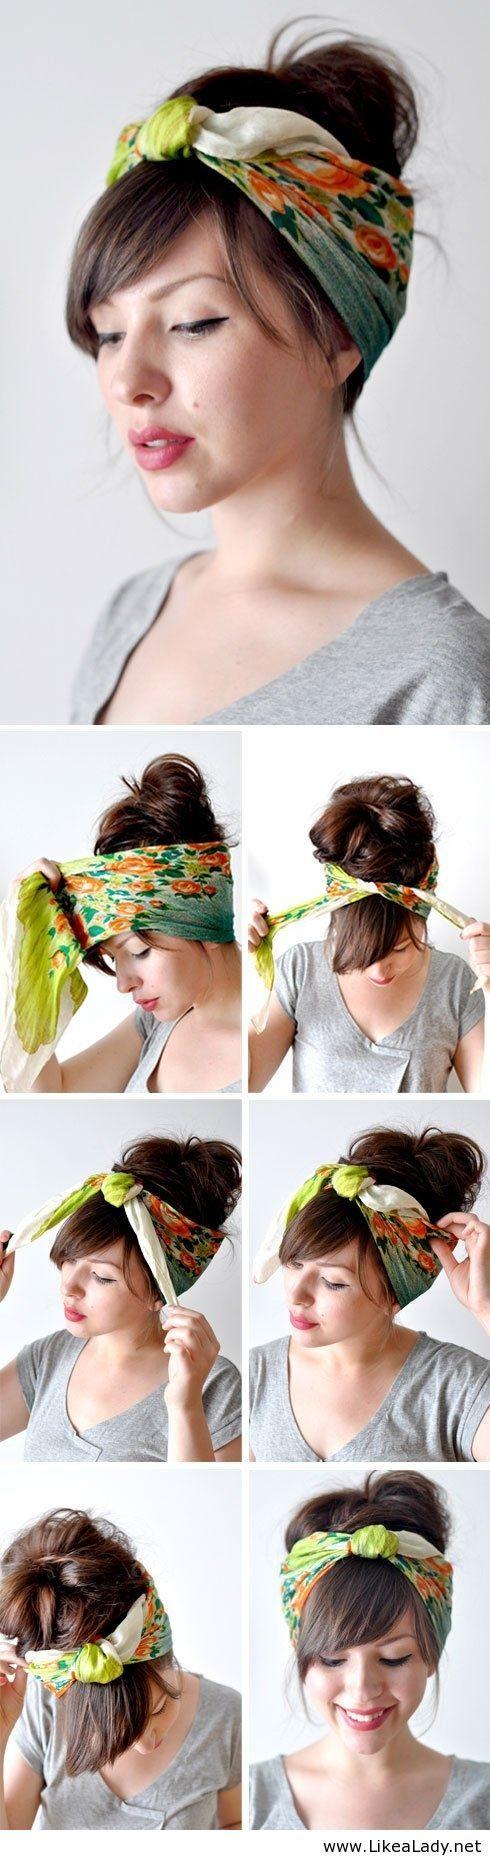 Bandana hairstyles top simple ways tutorials head scarf